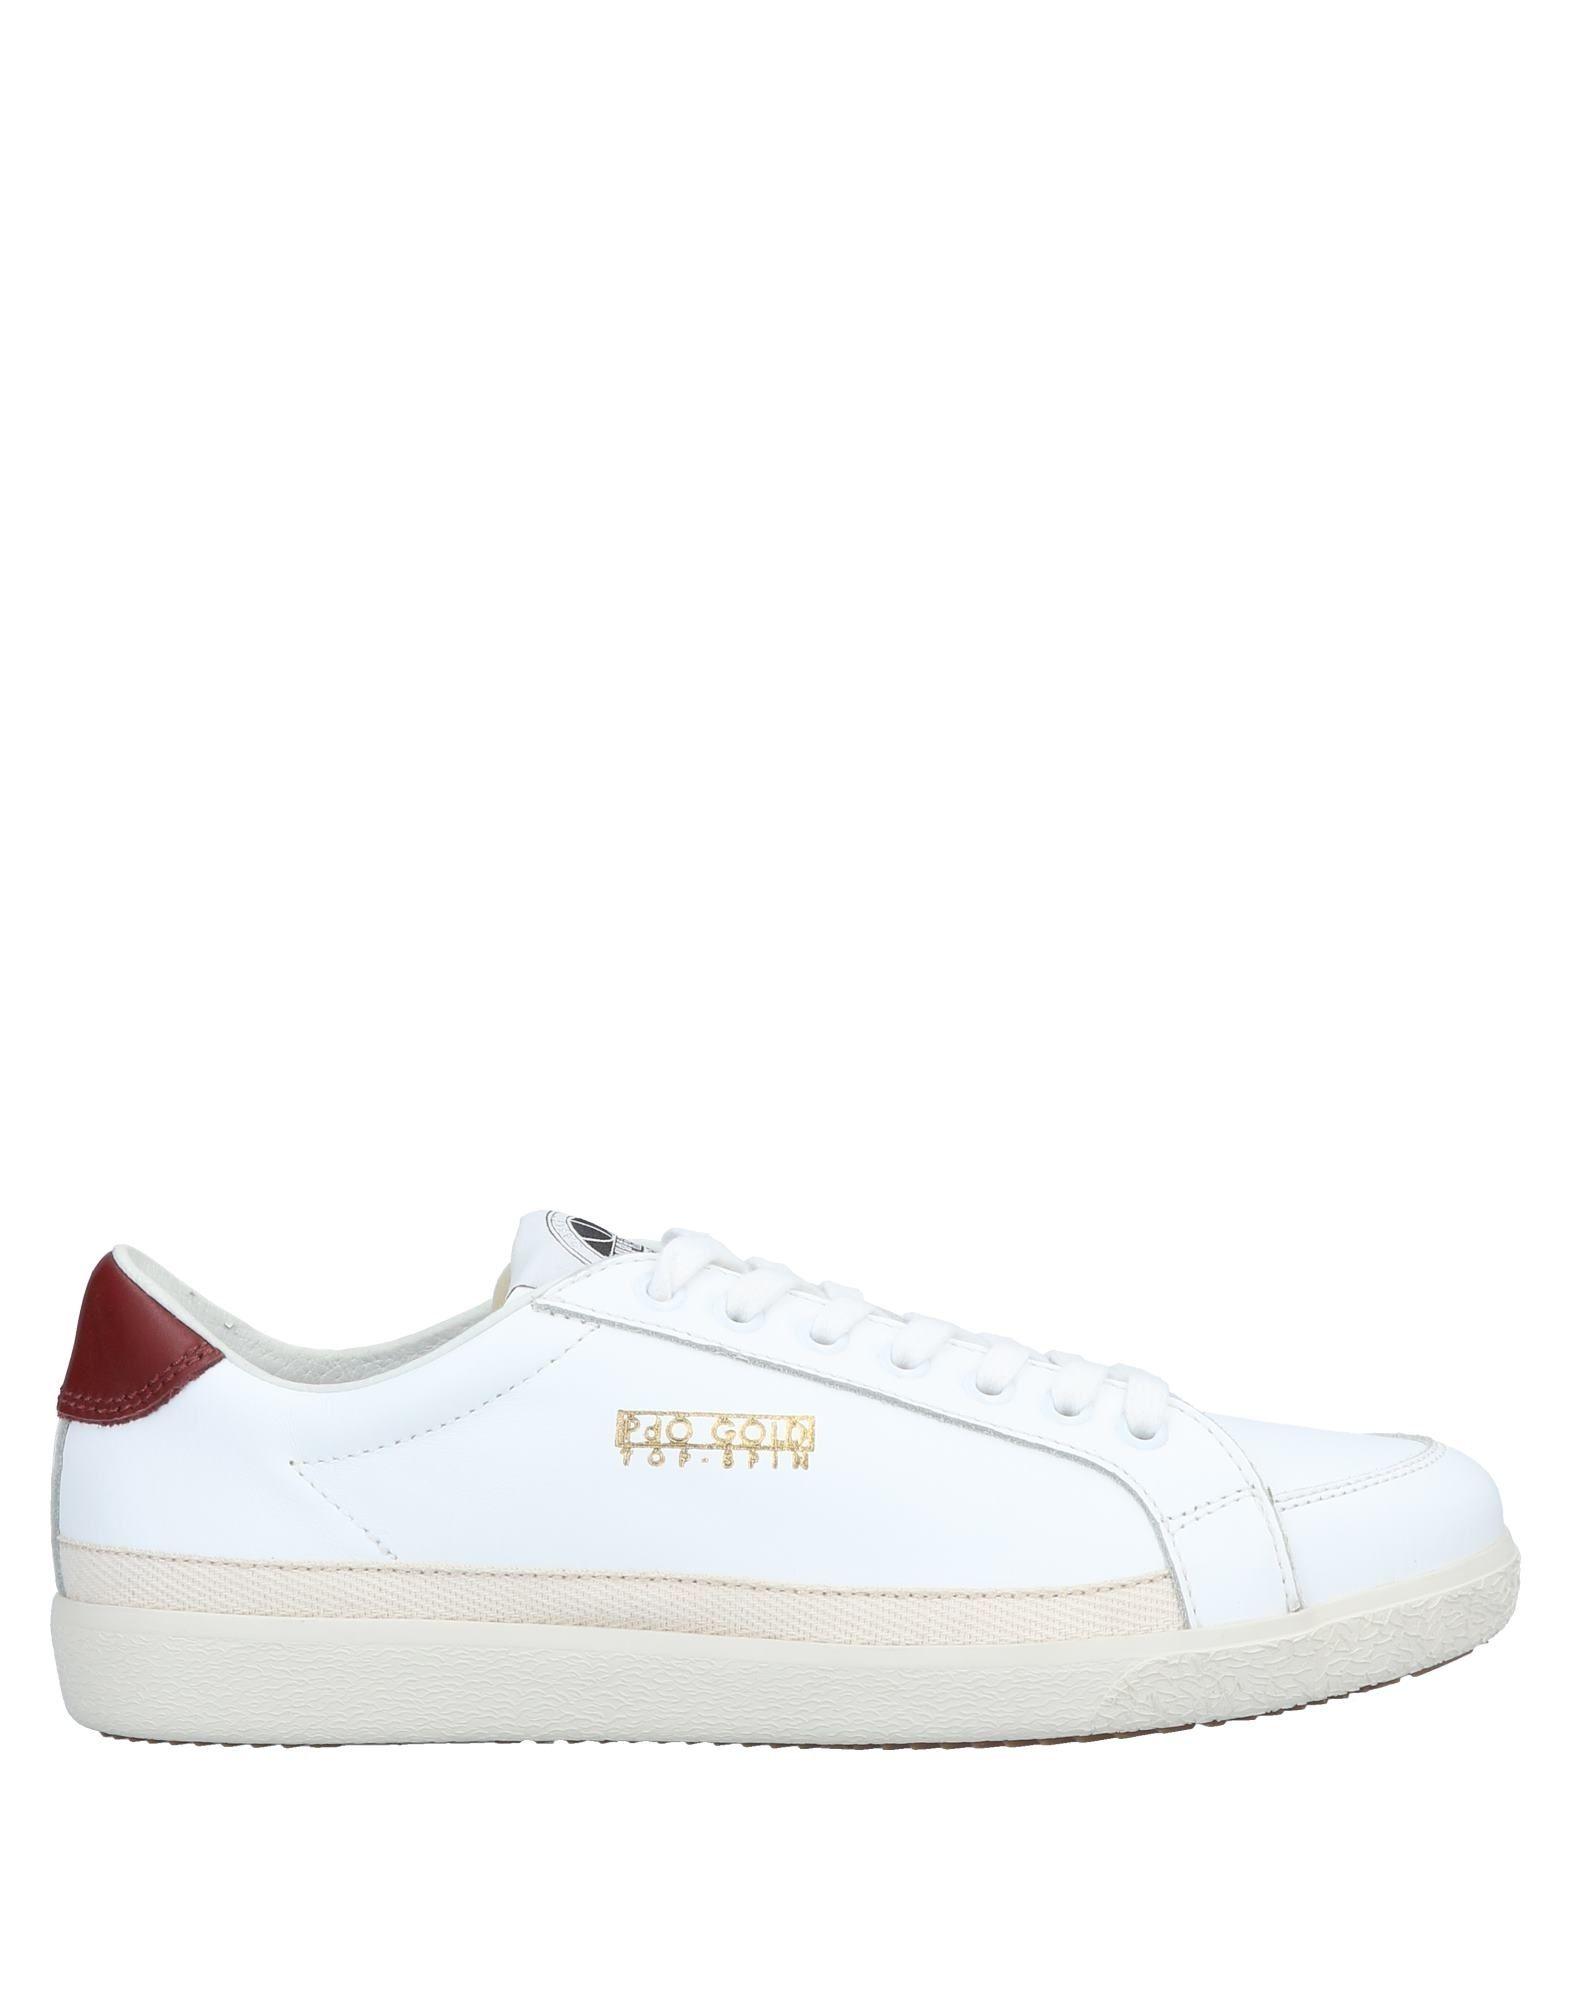 Zapatillas Pantofola D'oro Hombre - Zapatillas Zapatillas - Pantofola D'oro  Blanco a2840e